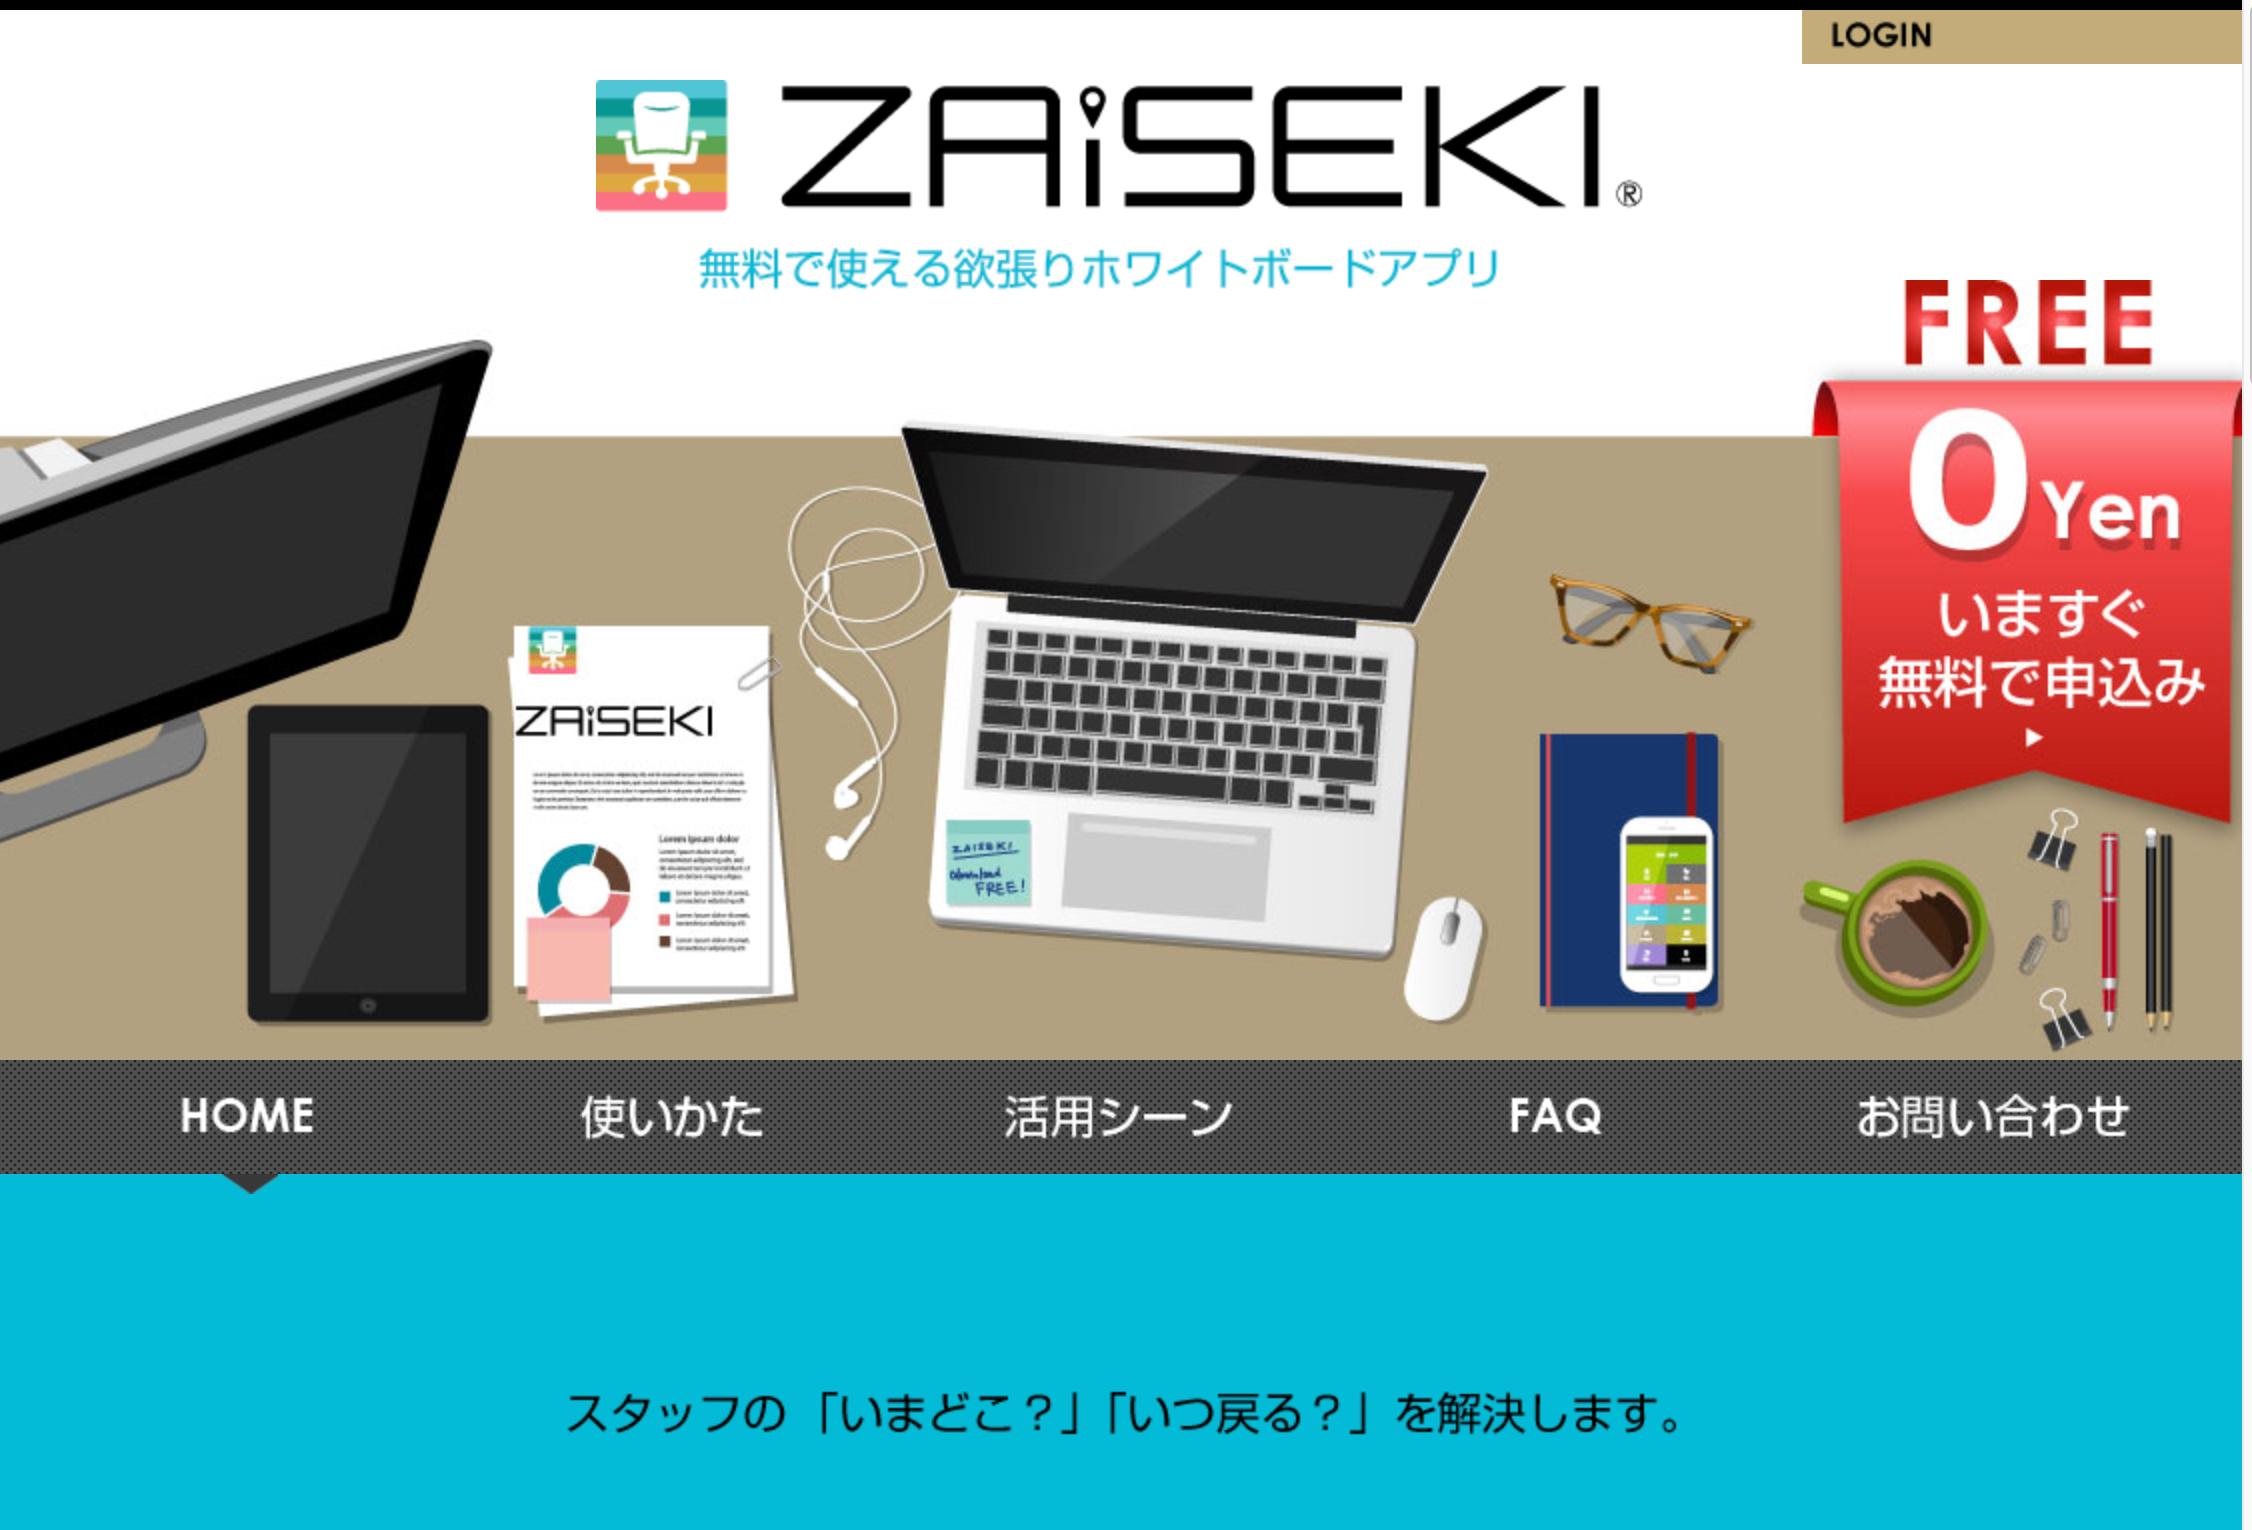 ZAiSEKIのサイトイメージ